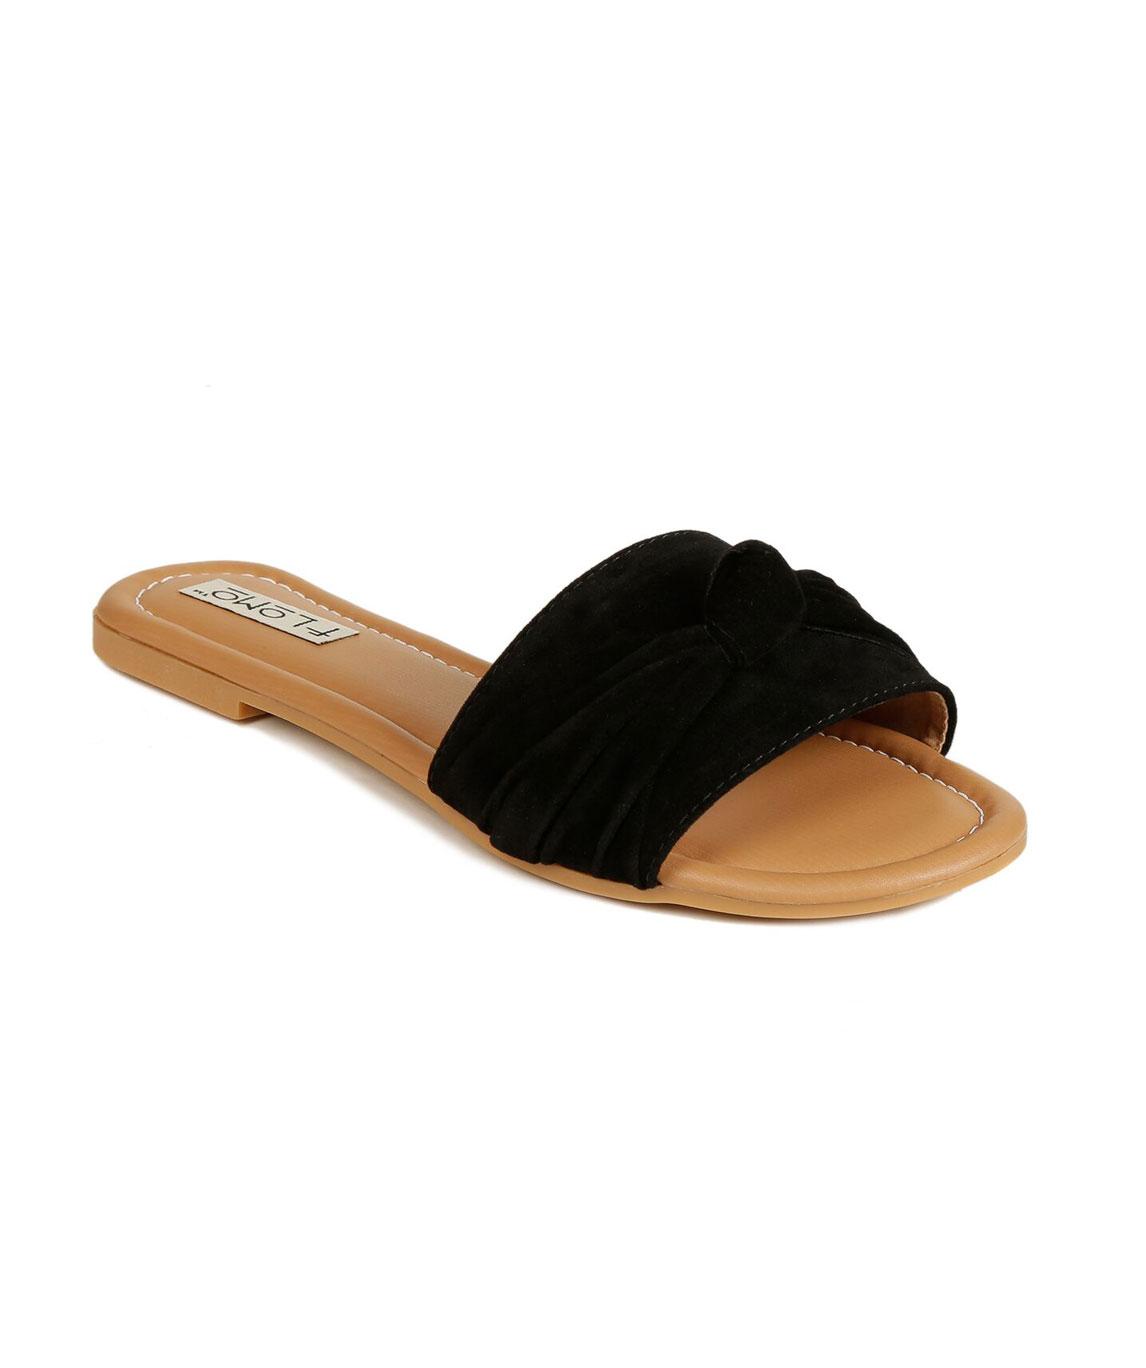 Flomo Women`s Black Resin Casual Flip Flop